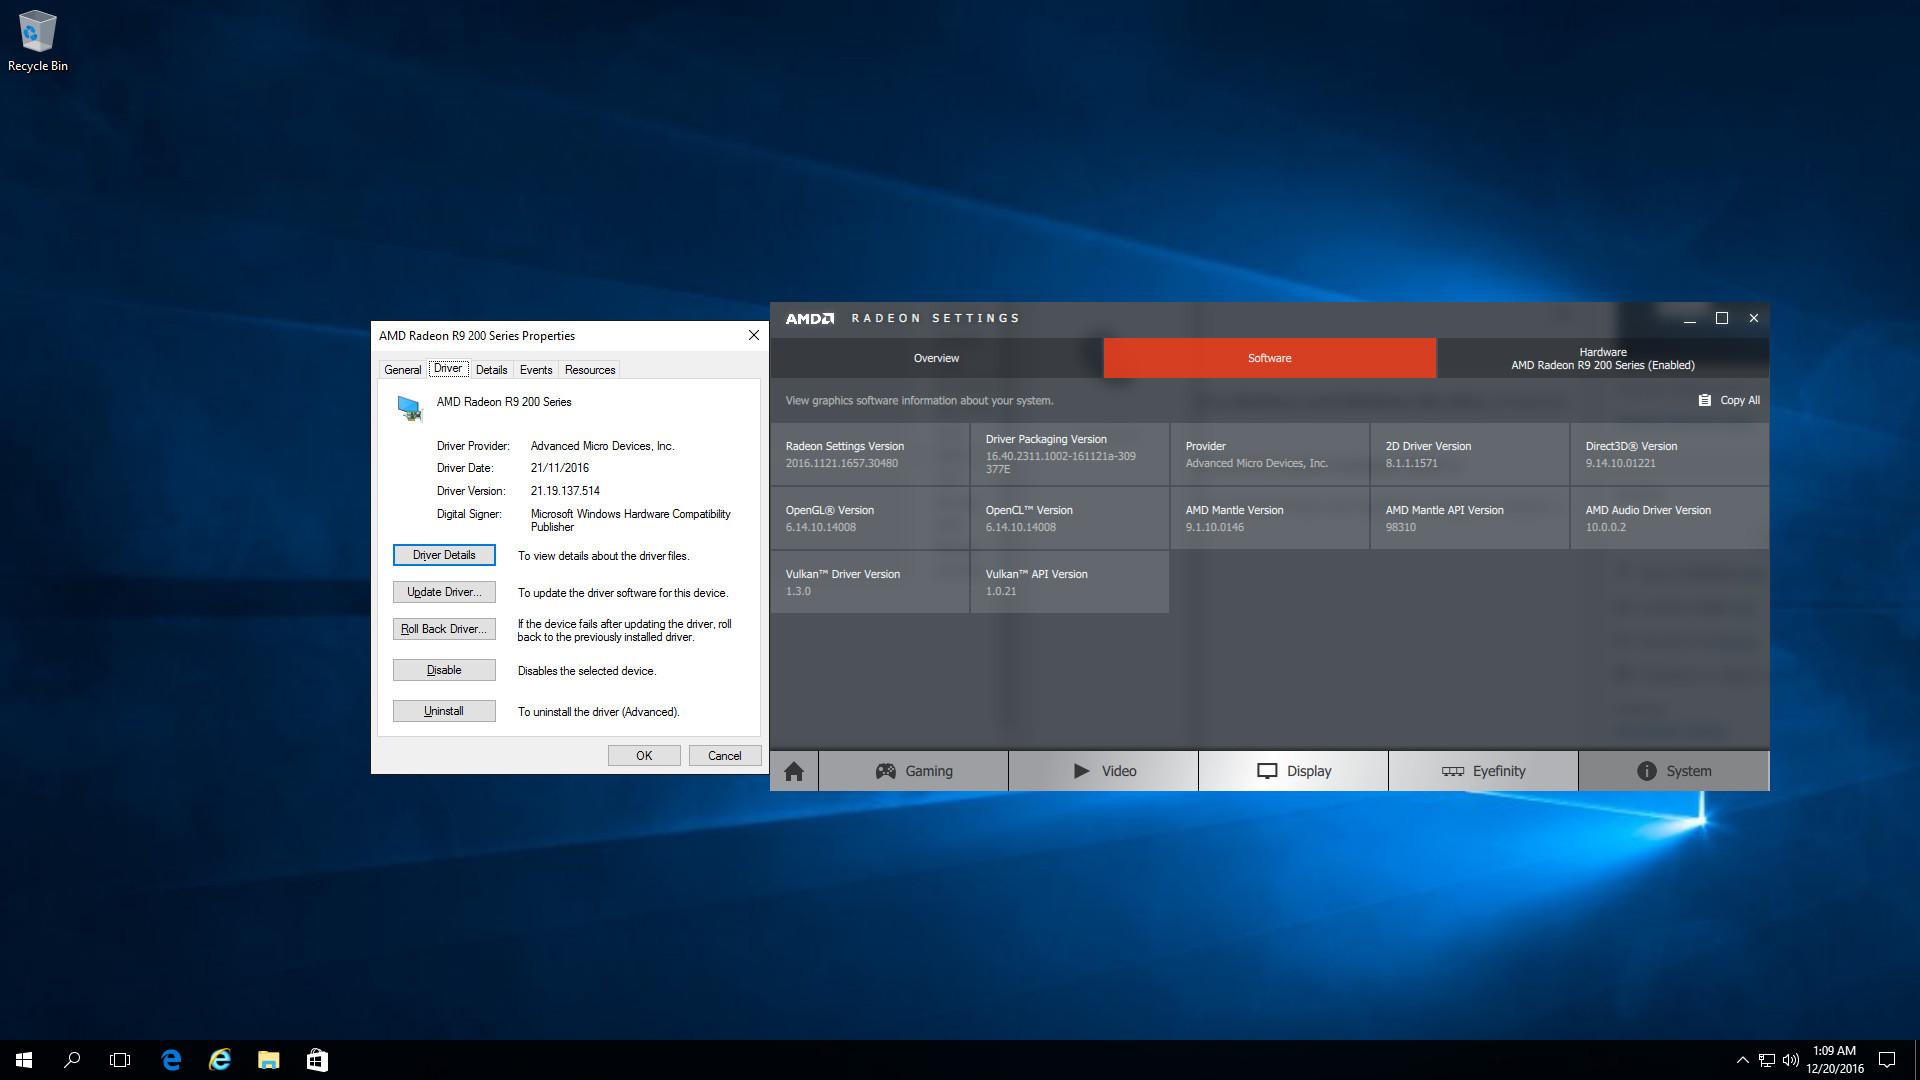 Resolve ATI Radeon black screen / BSOD crashes on Windows 10